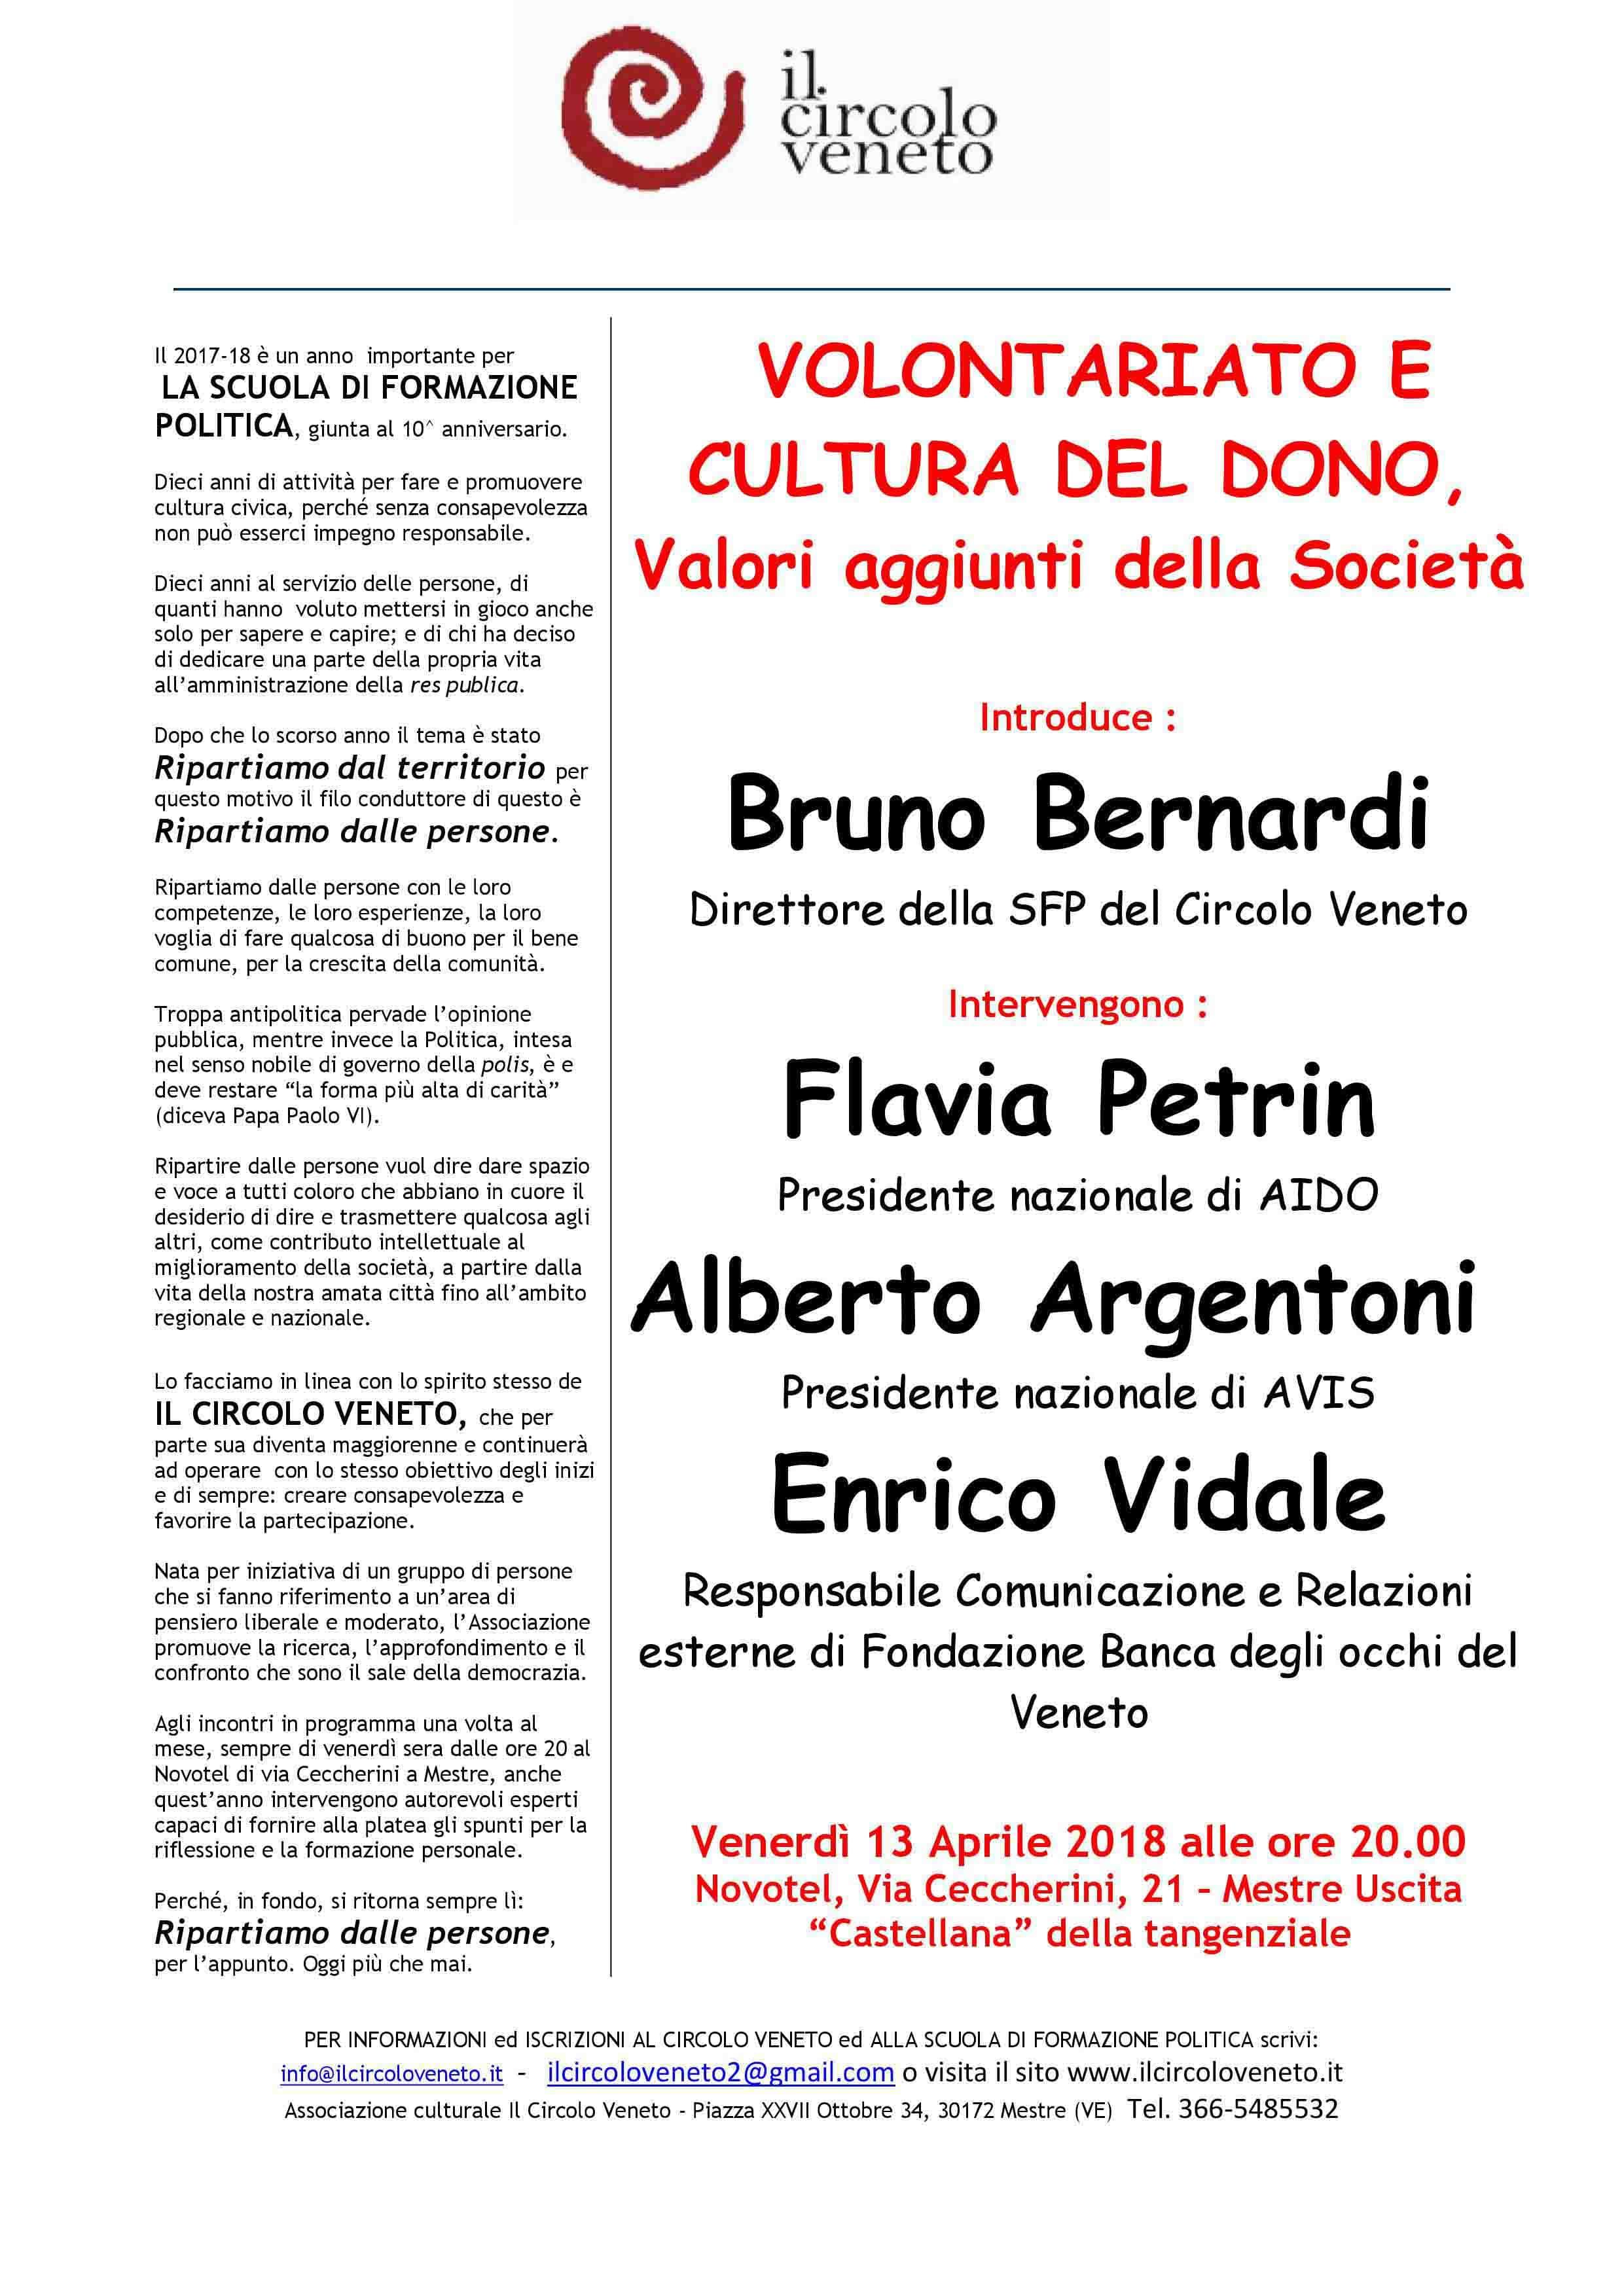 Petrin, Argentoni e Vidale al Circolo Veneto